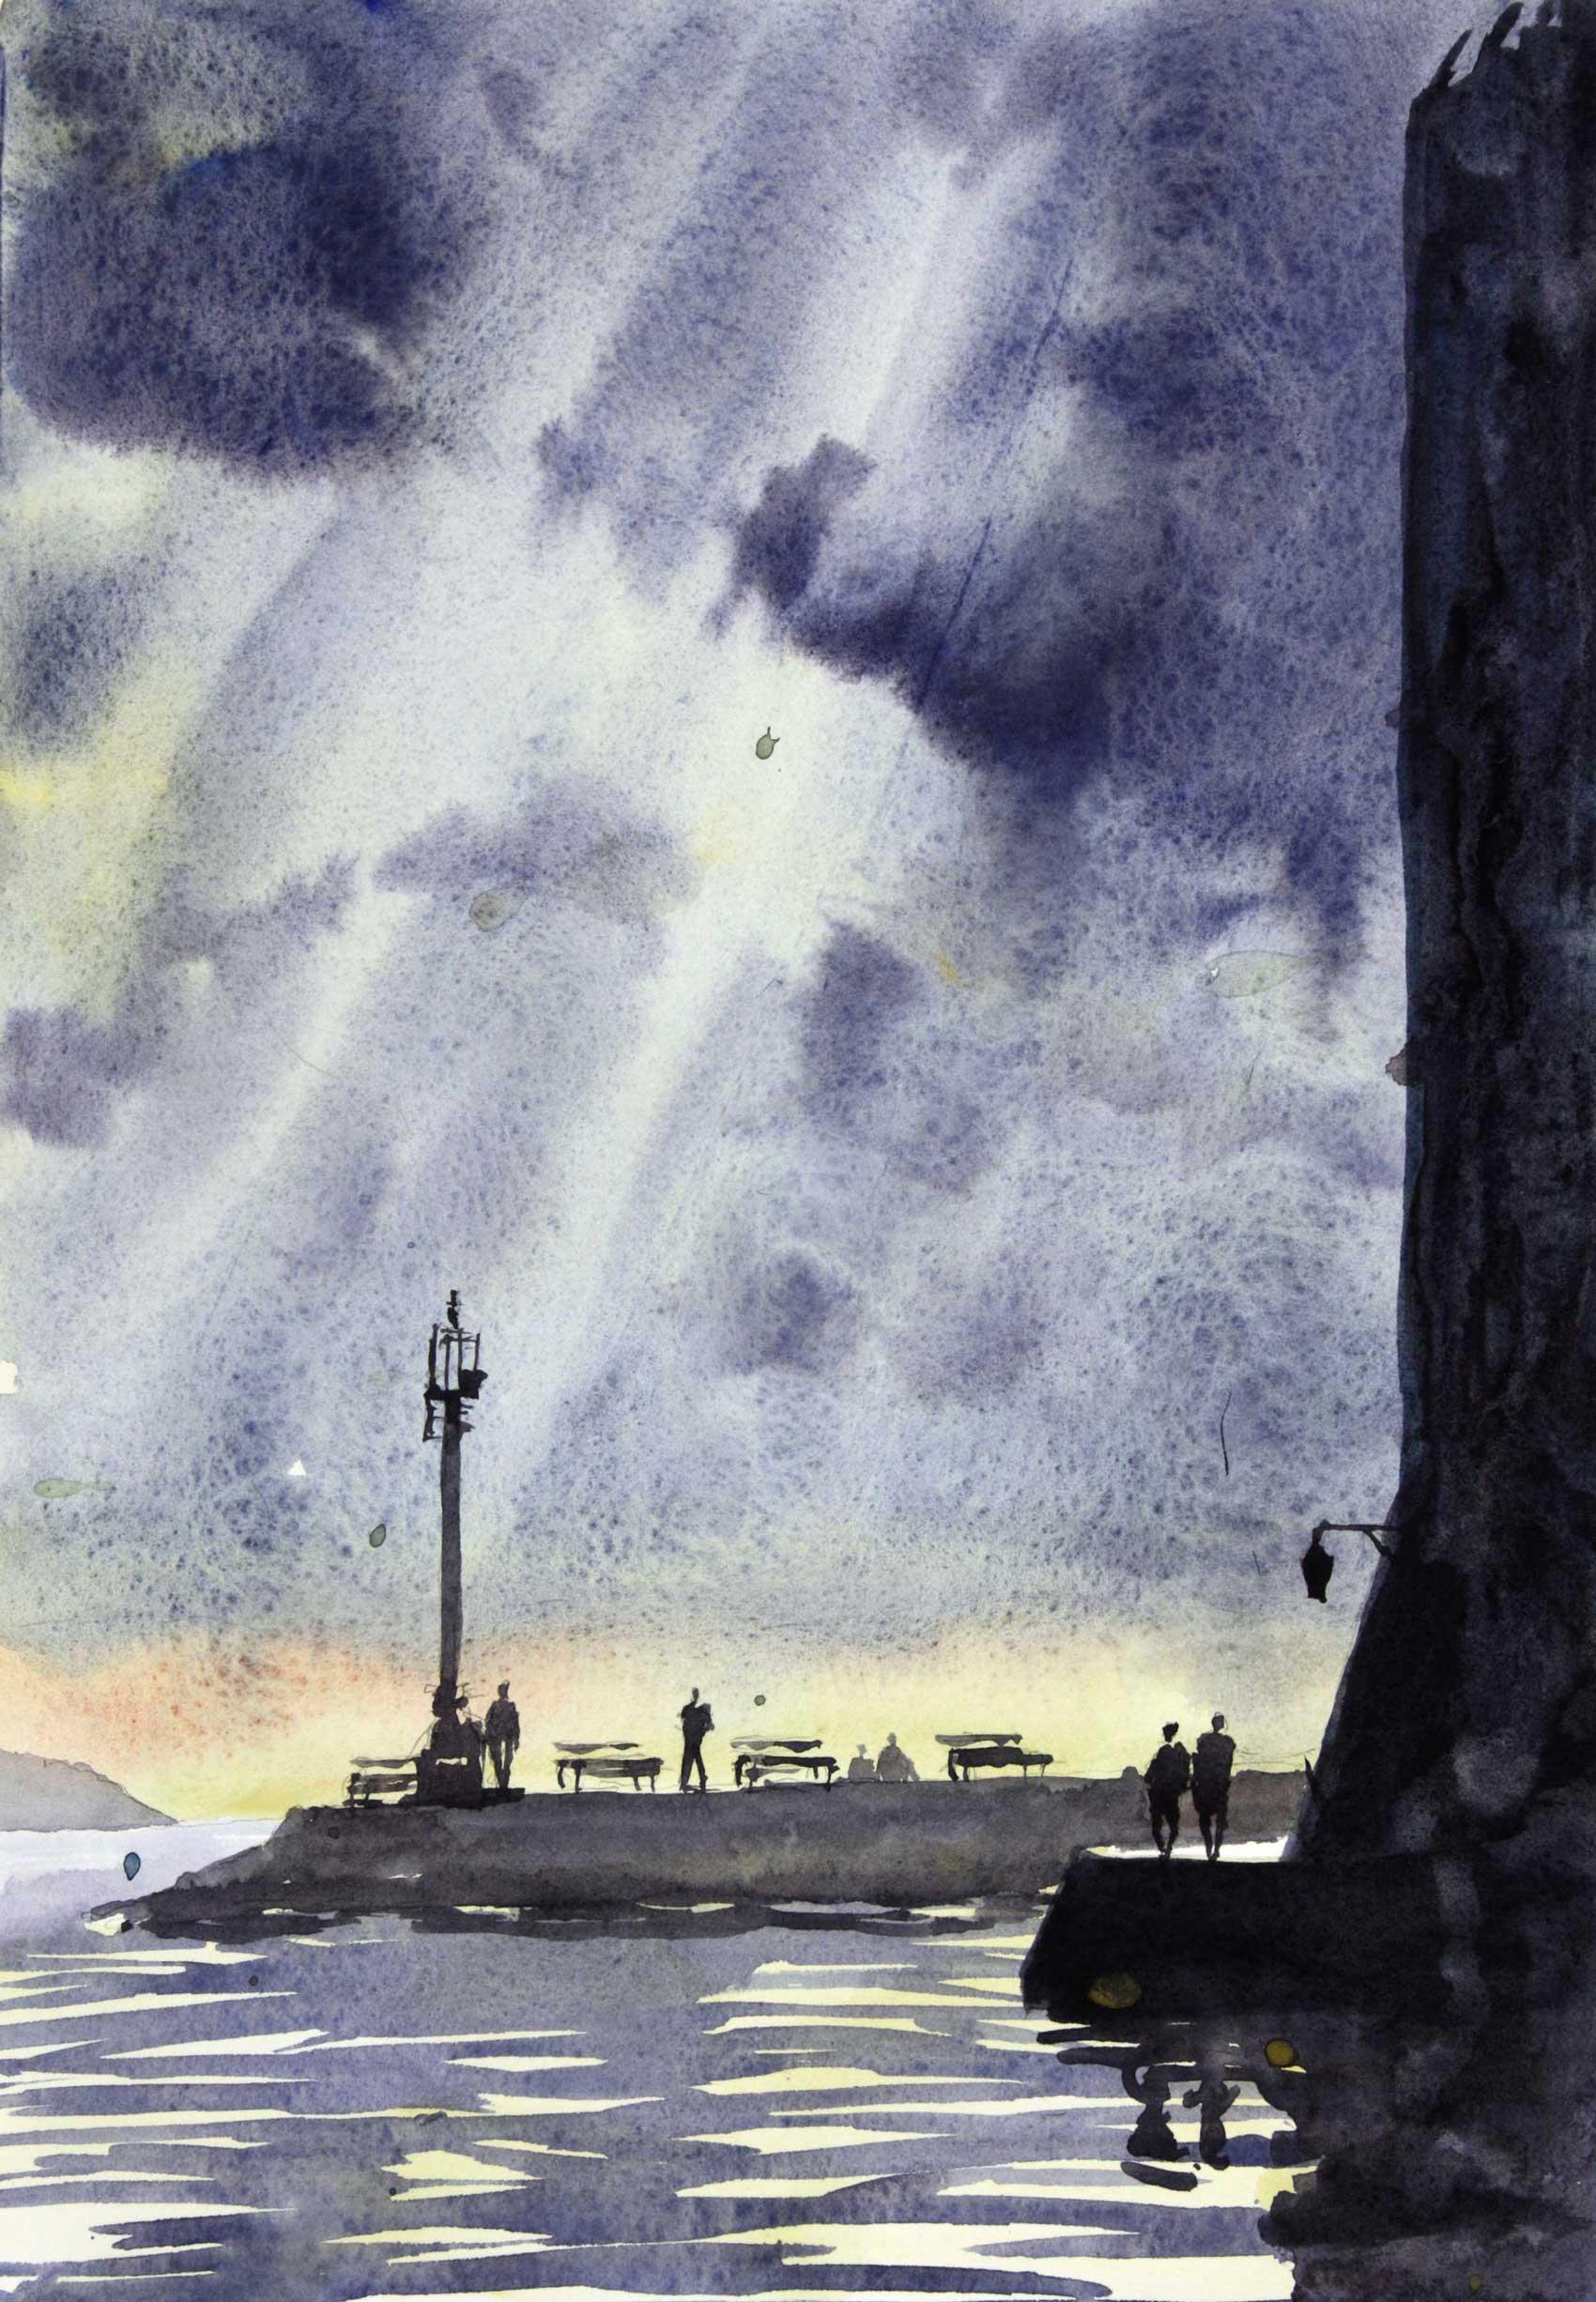 Breaking Clouds, Dubrovnik 24 x 35 cm